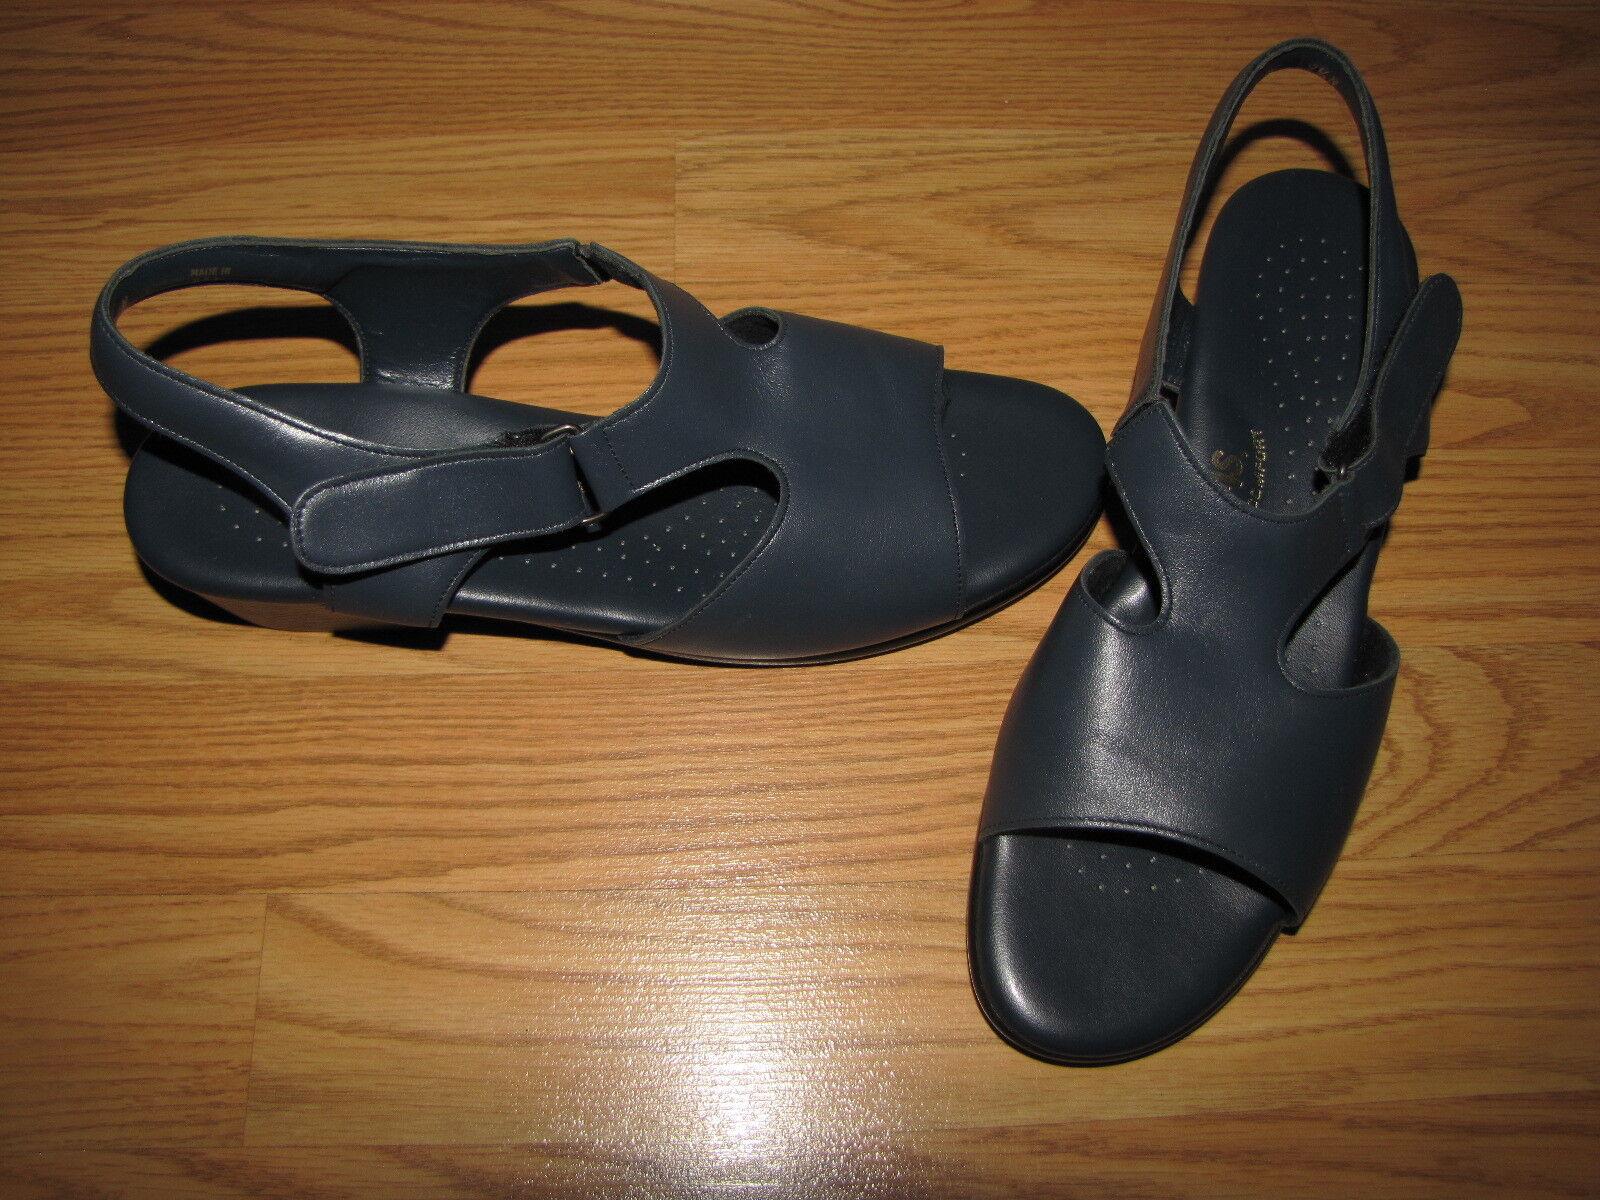 NWOB SAS 'Suntimer' Navy Kitten Heel Sandals - 9.5N European 41